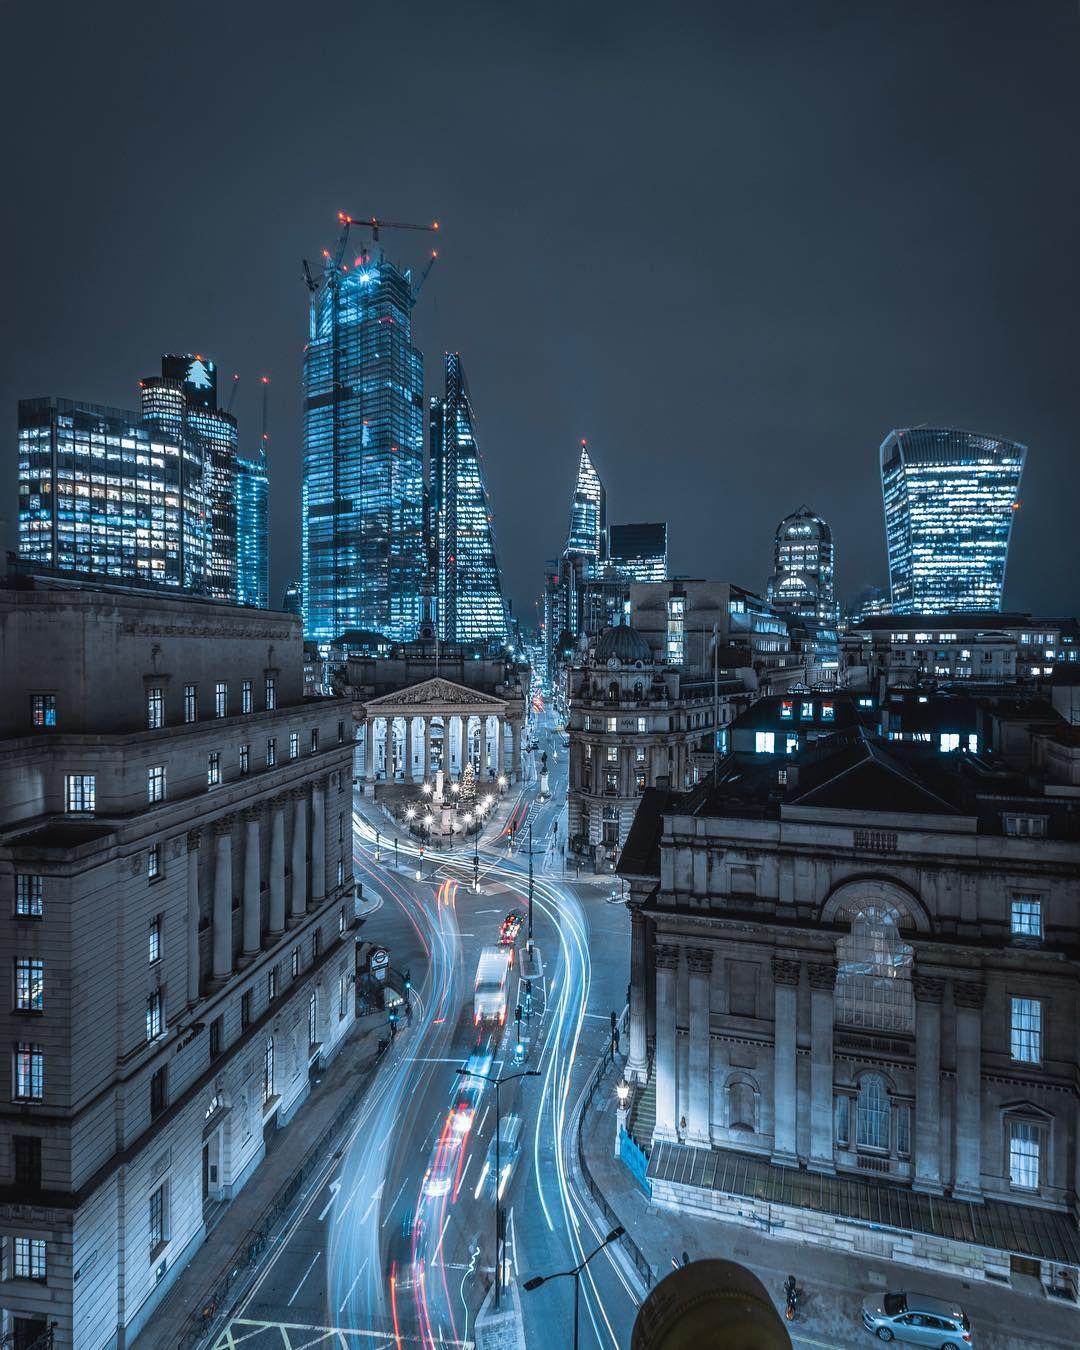 Moody Street Photos Of London After Dark By Luke Holbrook London Photos London Photography City Aesthetic